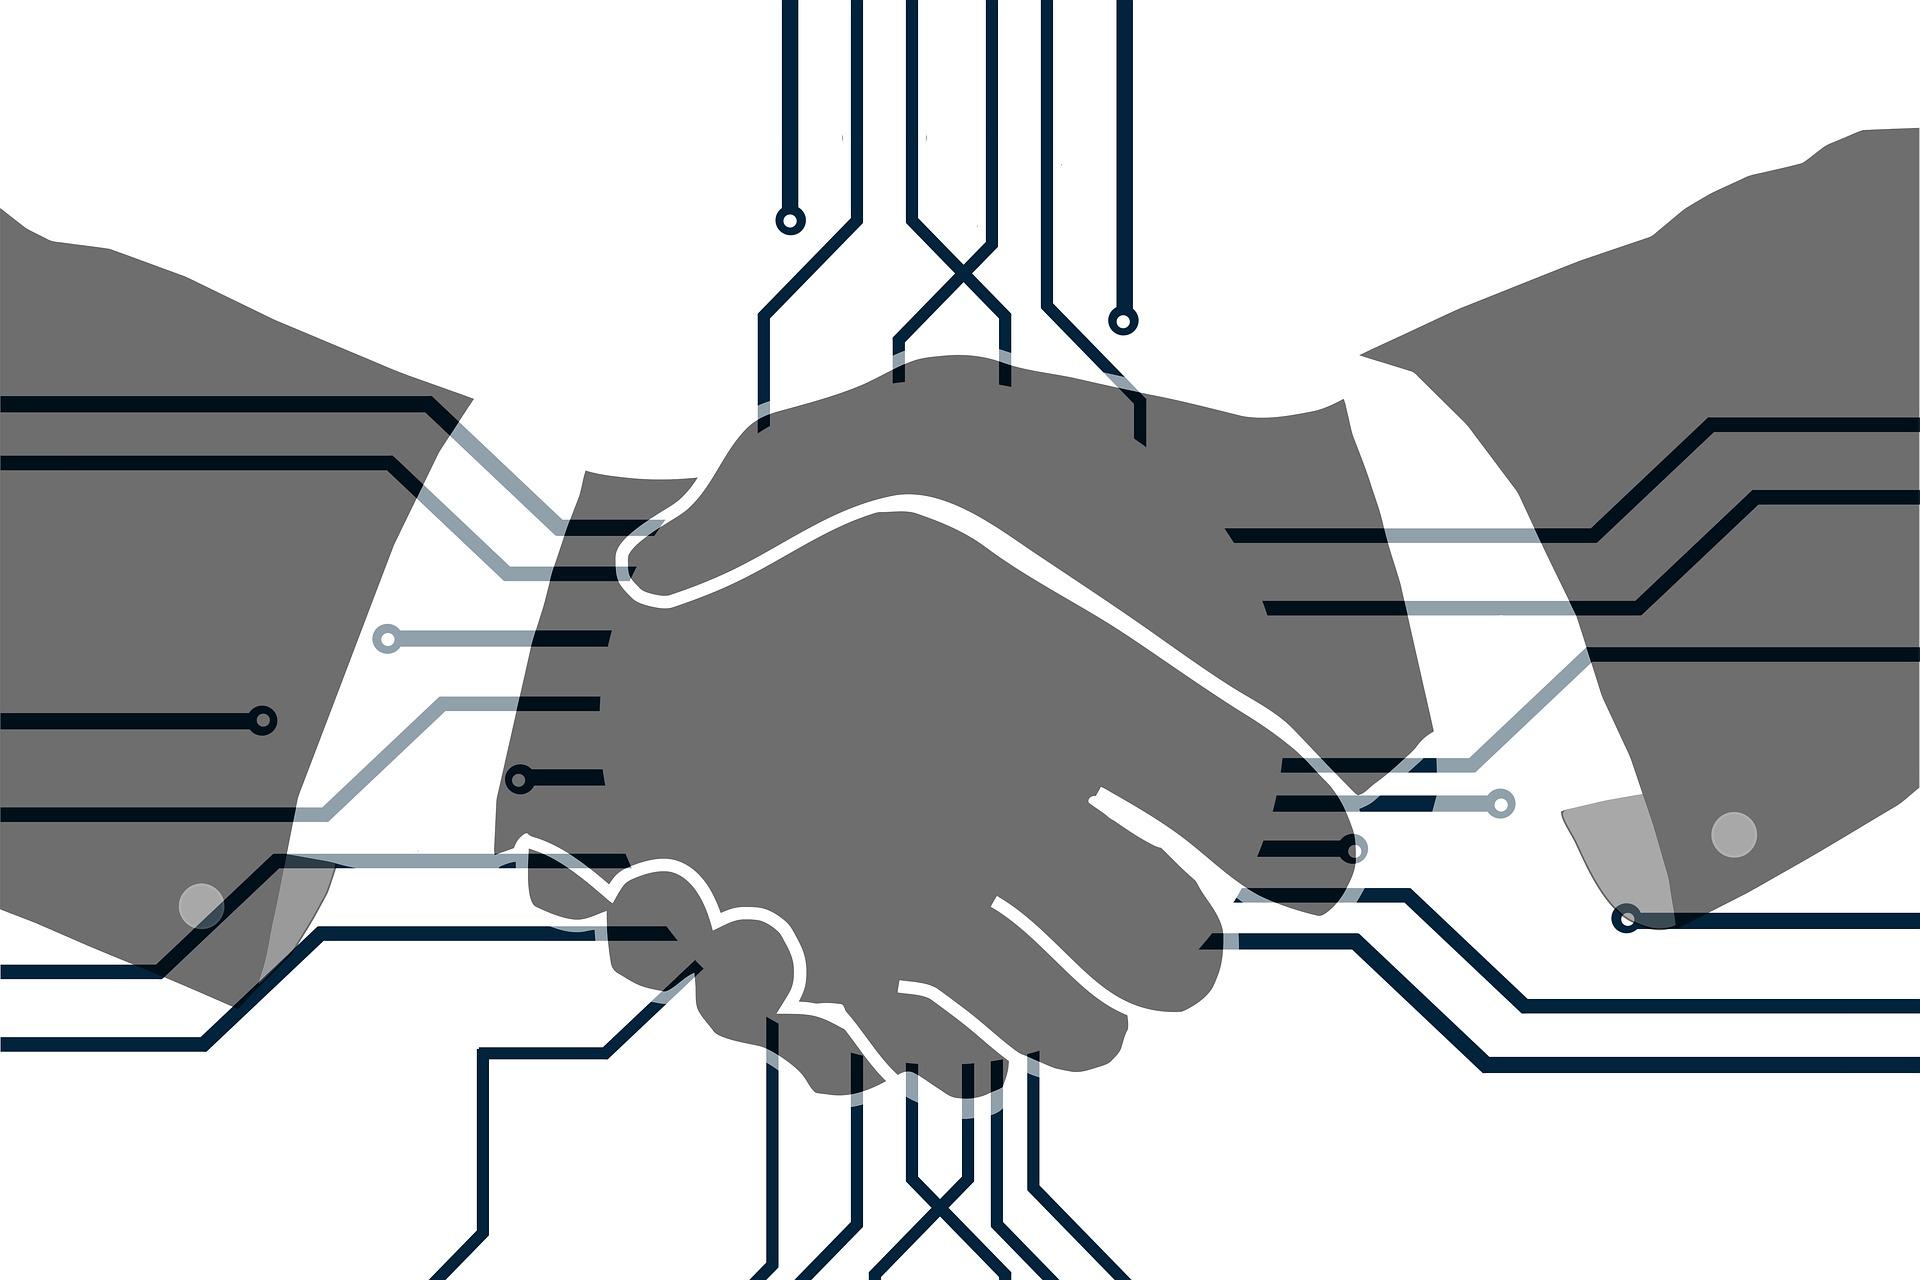 Digitaler Handshake (Symbolbild: Digitalisierung)